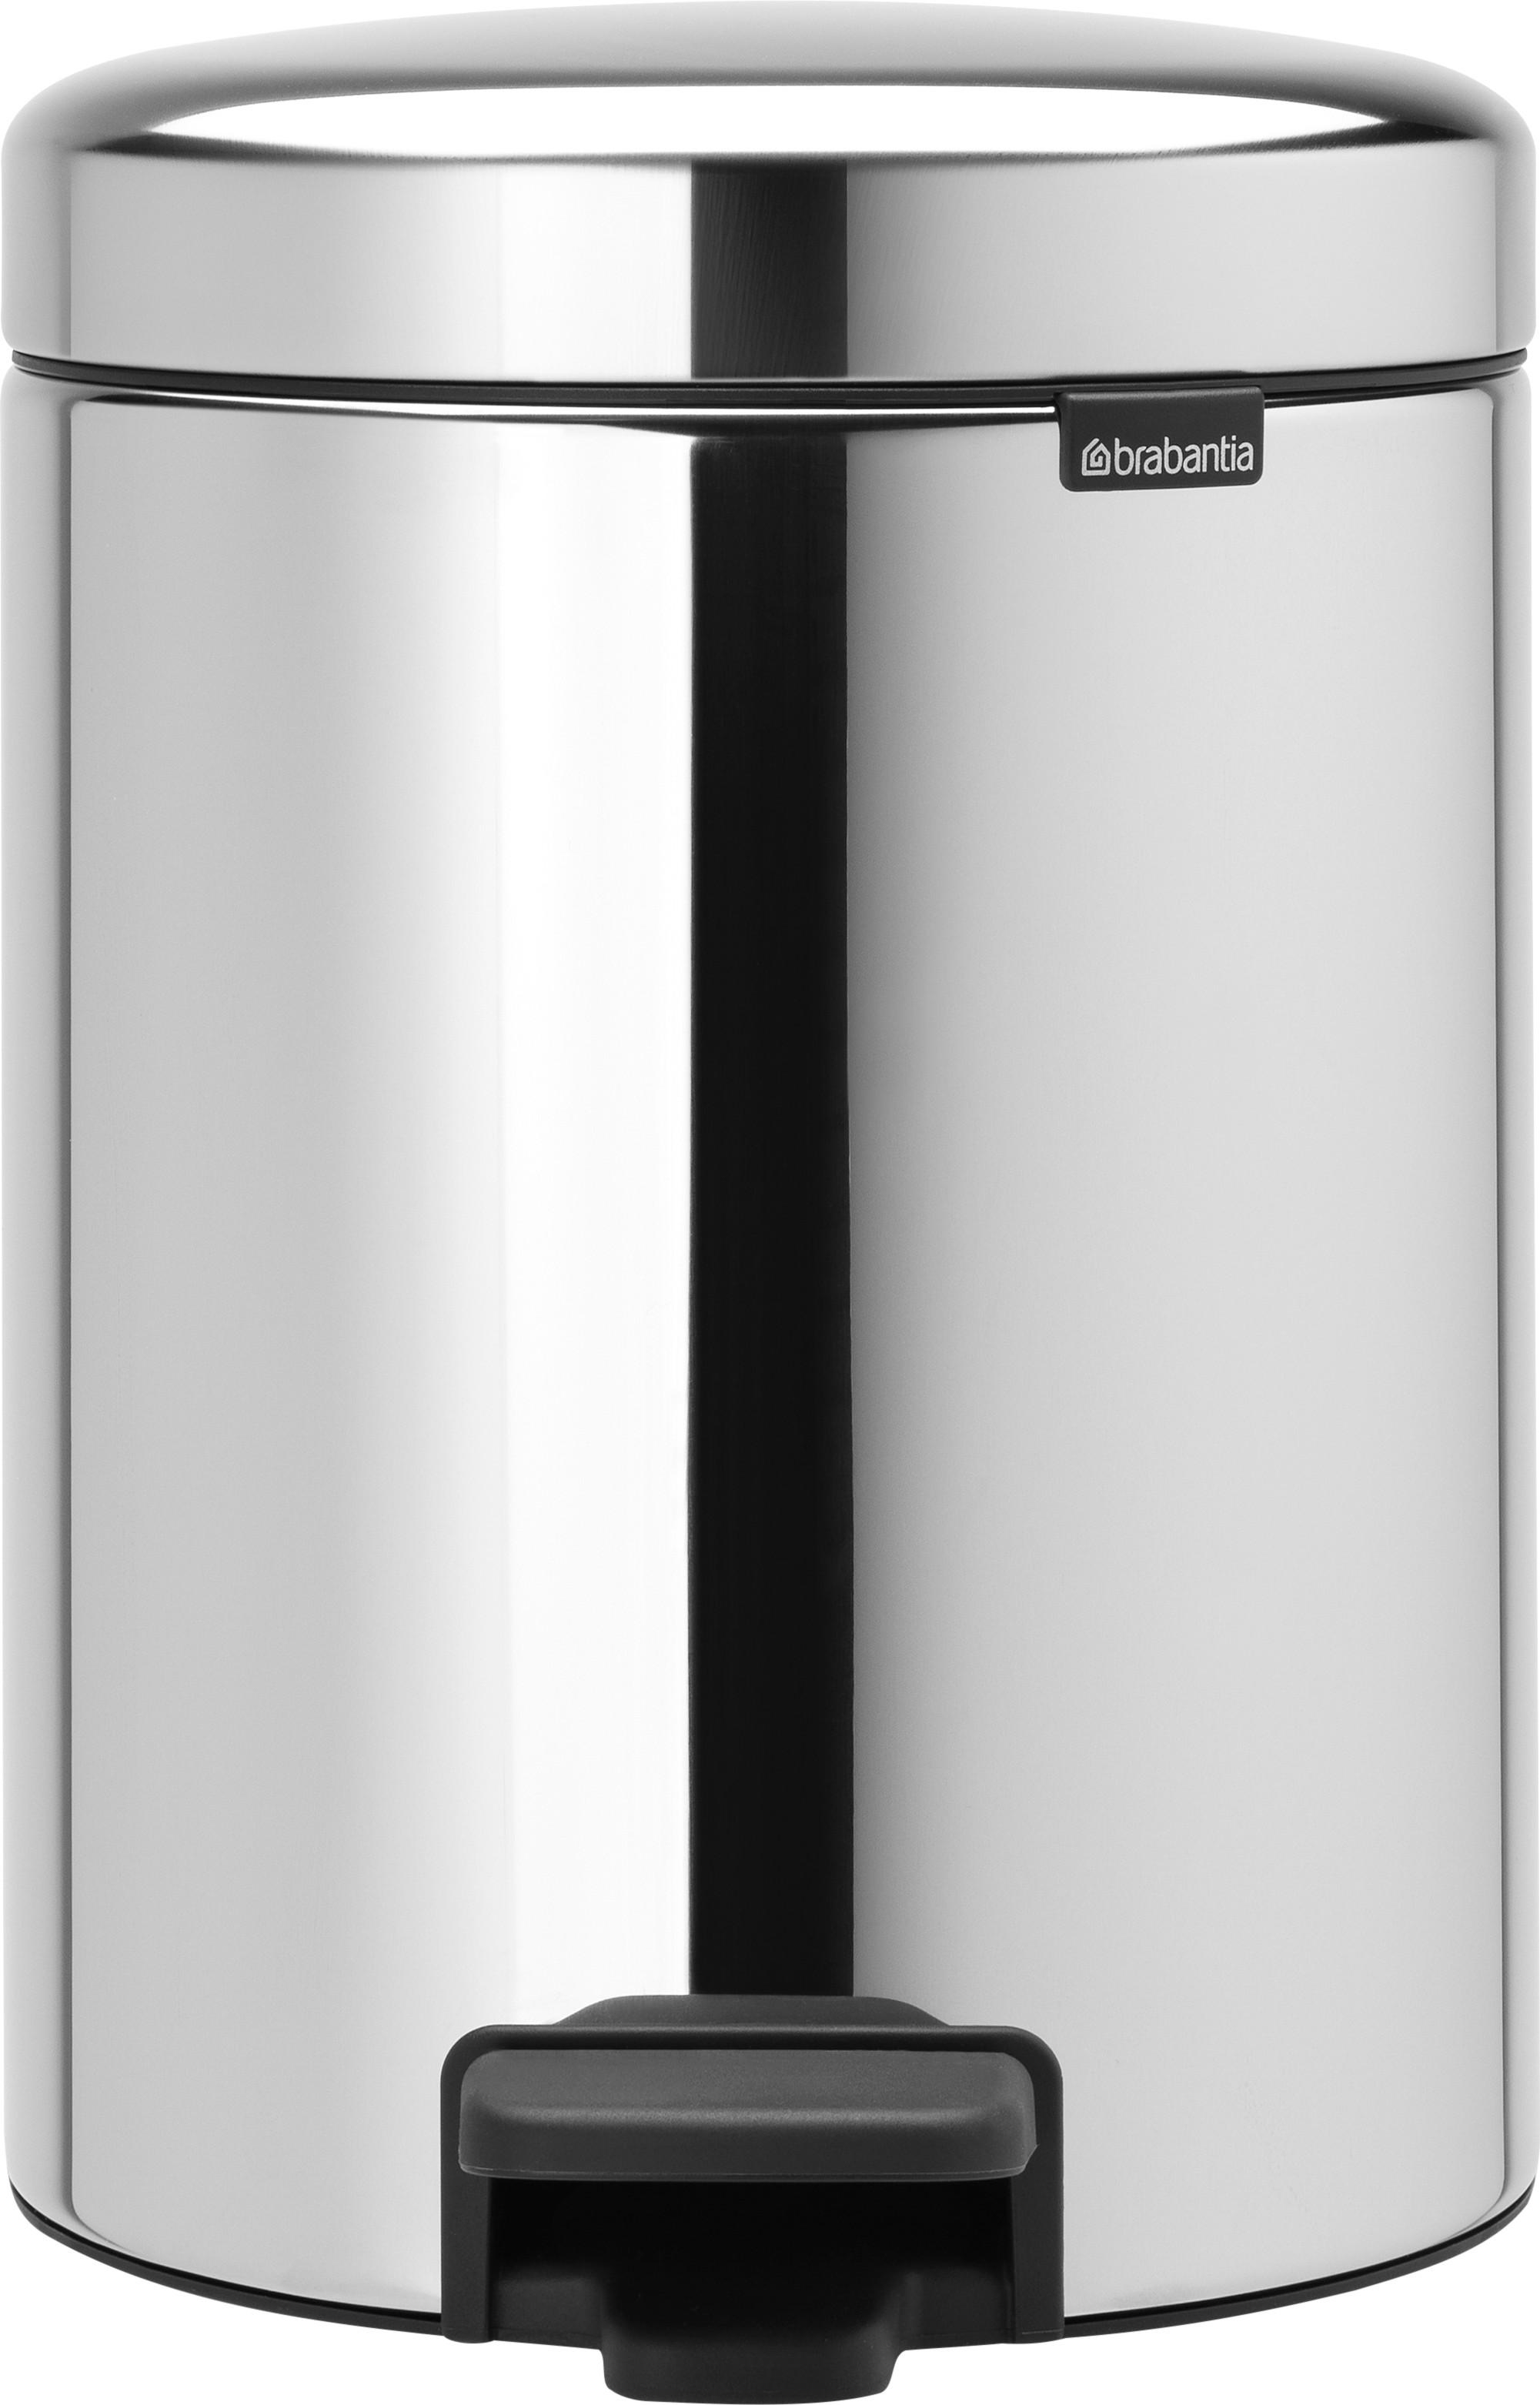 Badkamer retro badkamer radiator : Badkamer: Prullenbak of afvalemmer nodig shop op xenos. badkamer ...